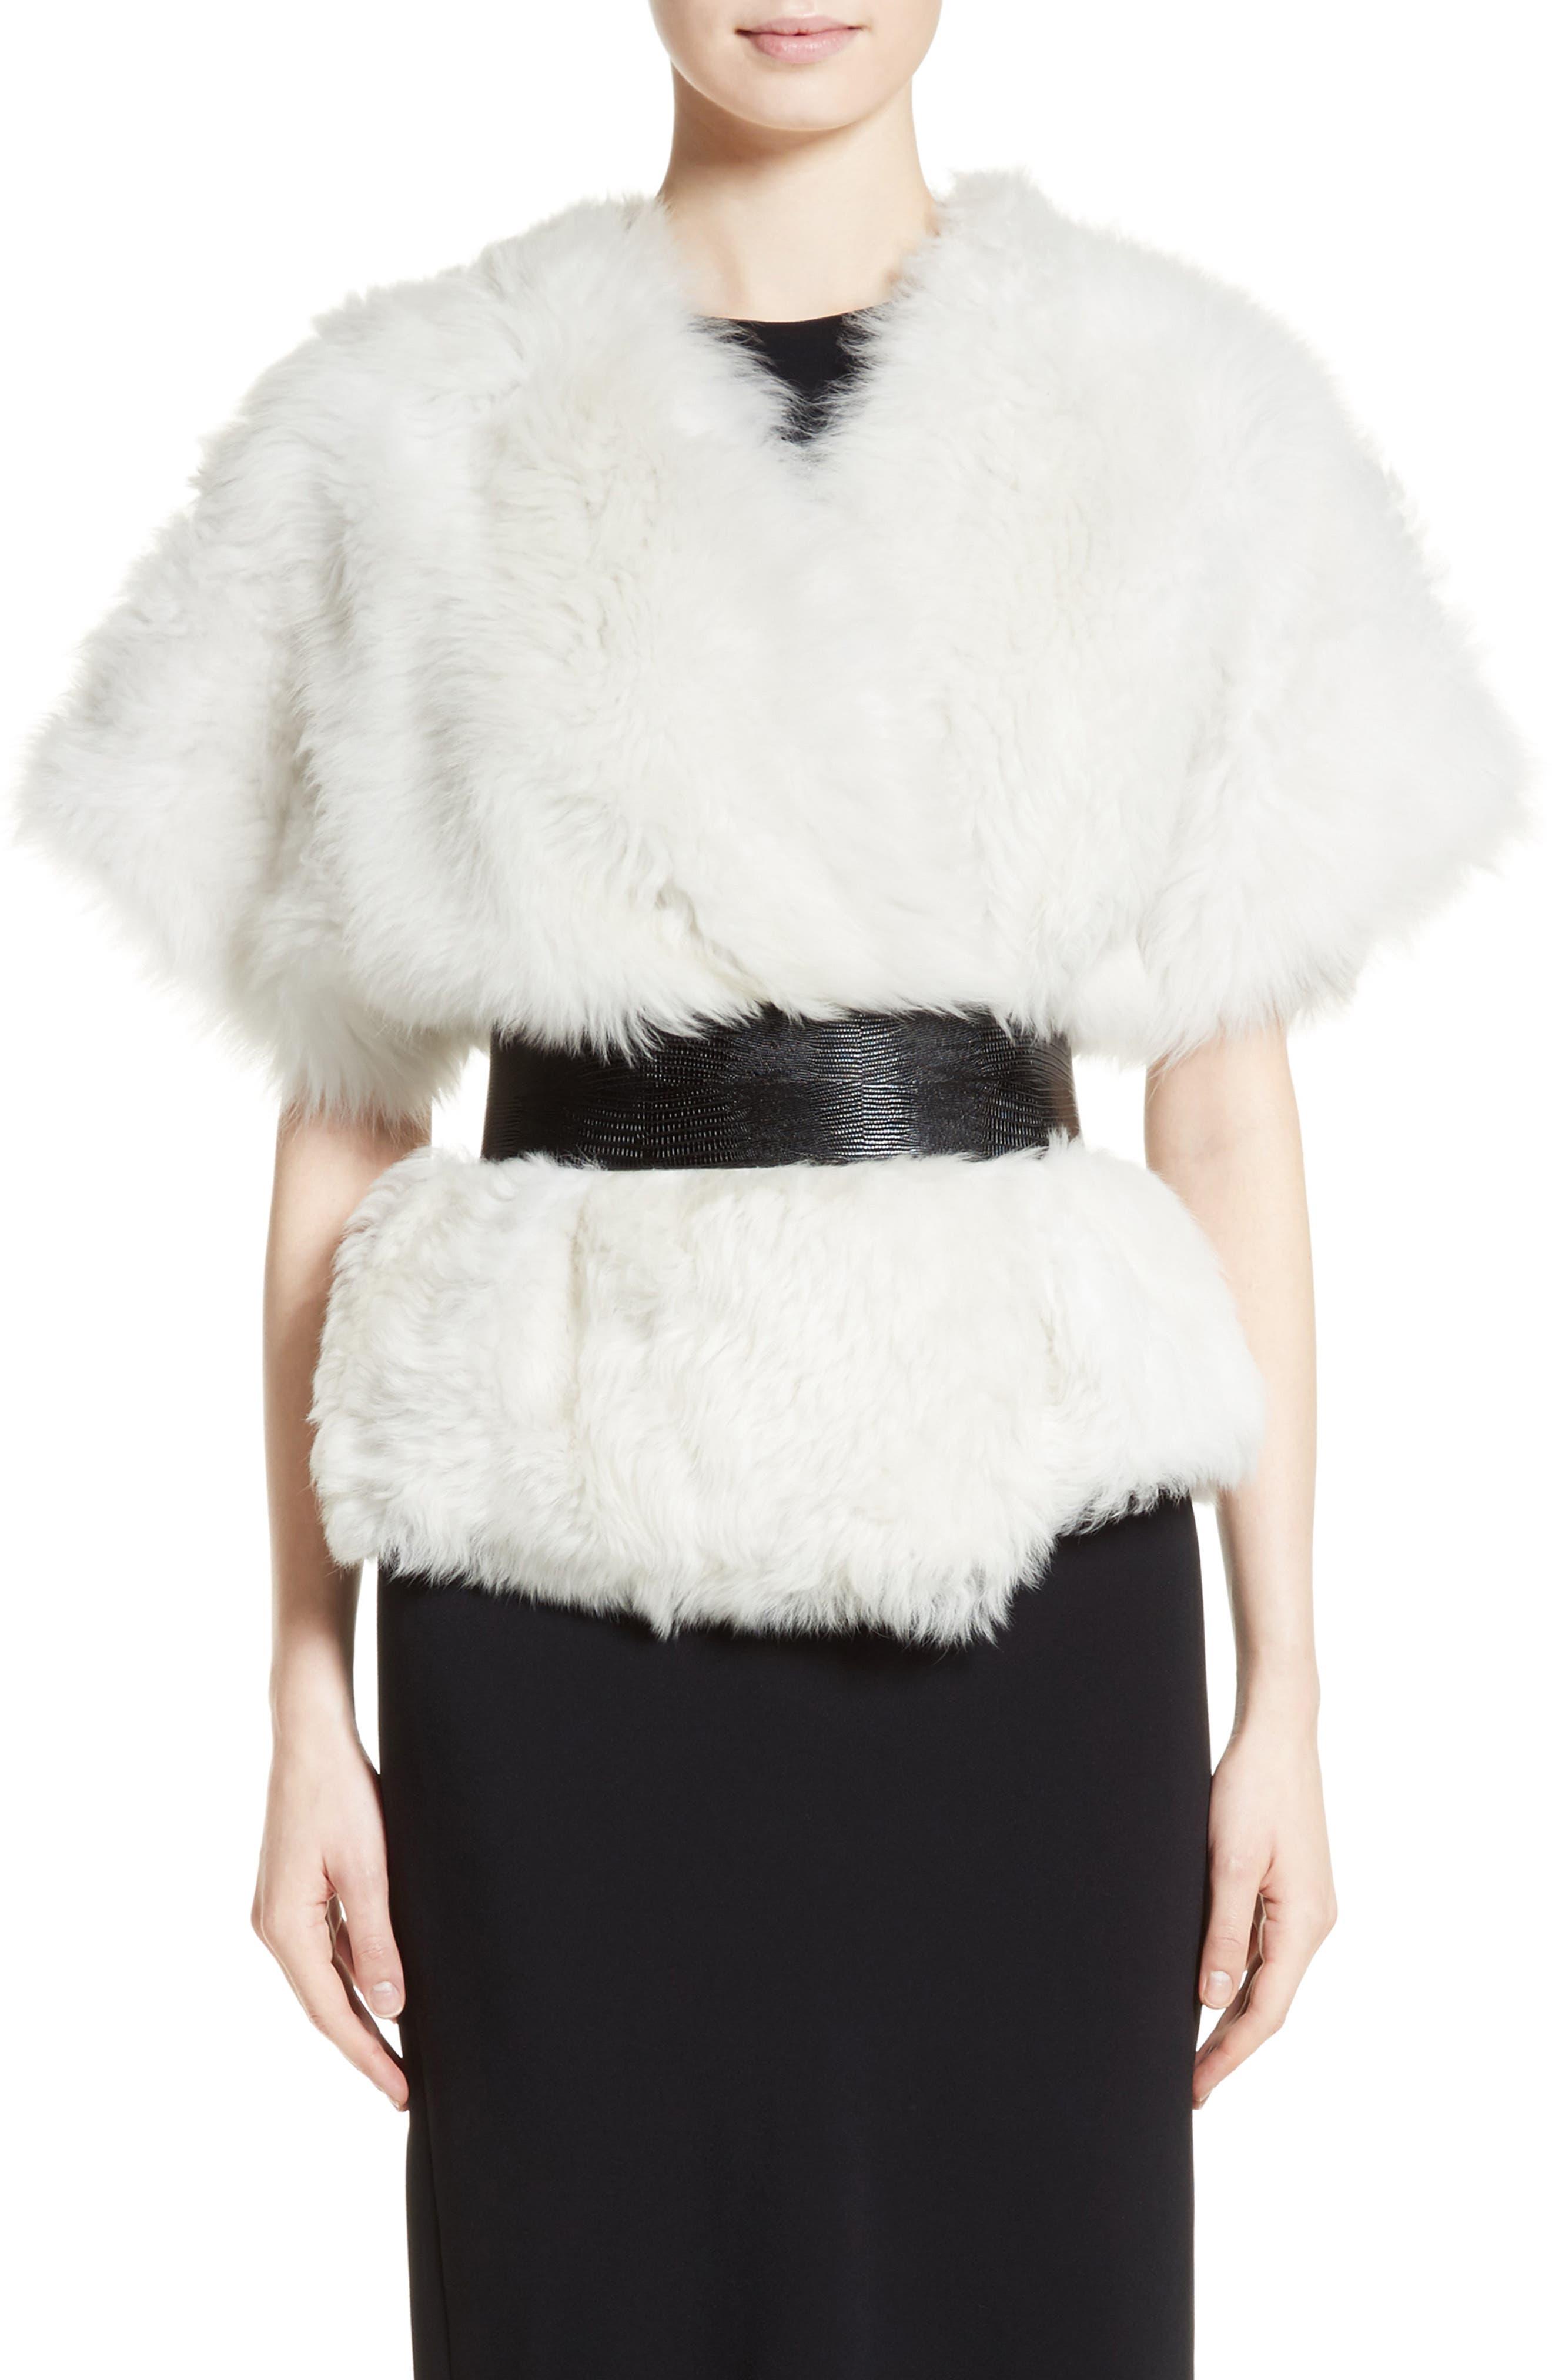 Main Image - Max Mara Fiorigi Genuine Lamb Fur Bolero